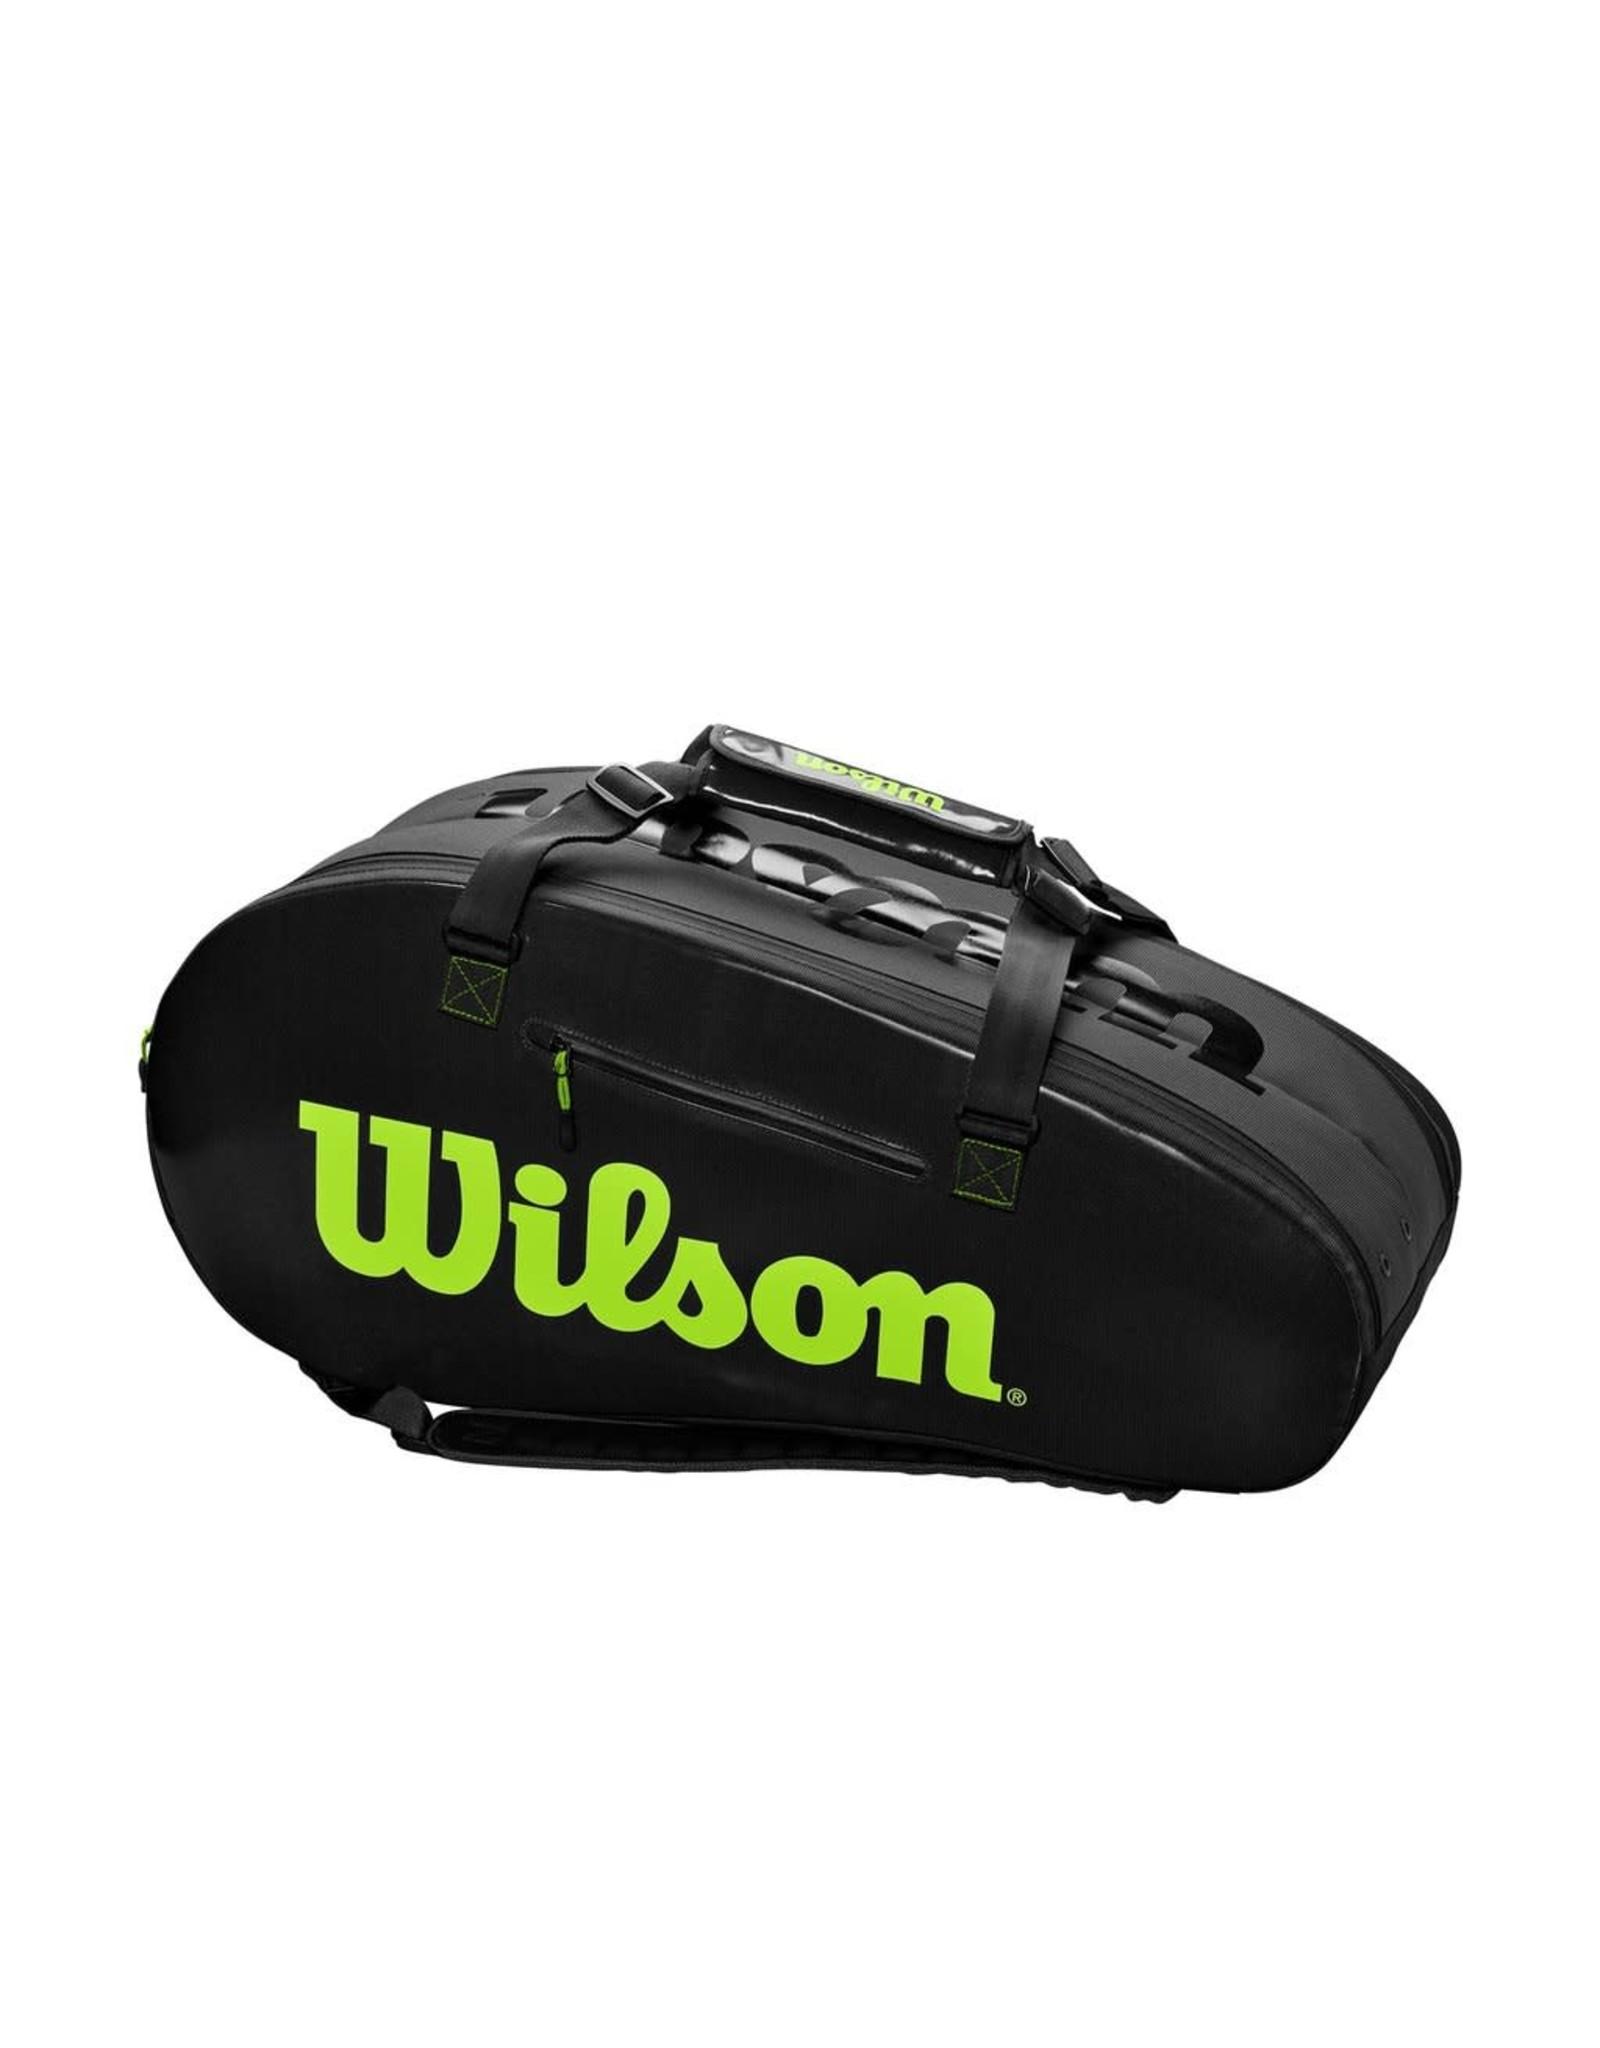 Wilson Super Tour 2 Comp (Charco/Green)